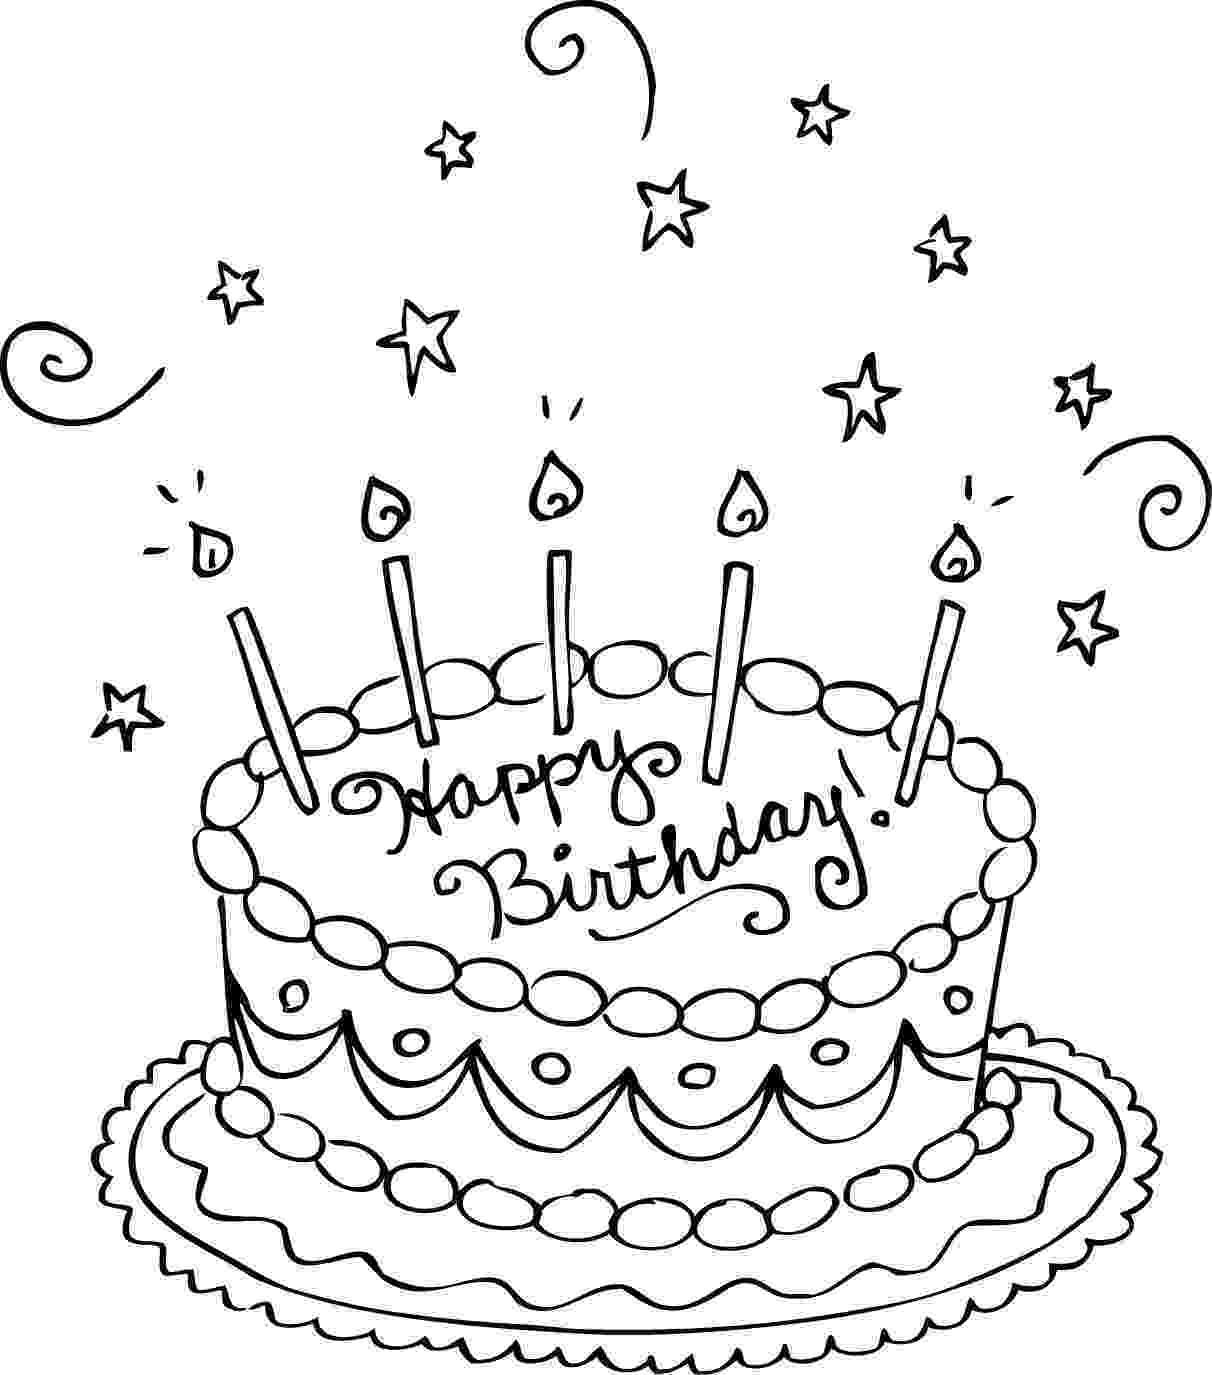 pj masks birthday cake dibujos e imágenes de pj masks para imprimir y colorear masks cake pj birthday